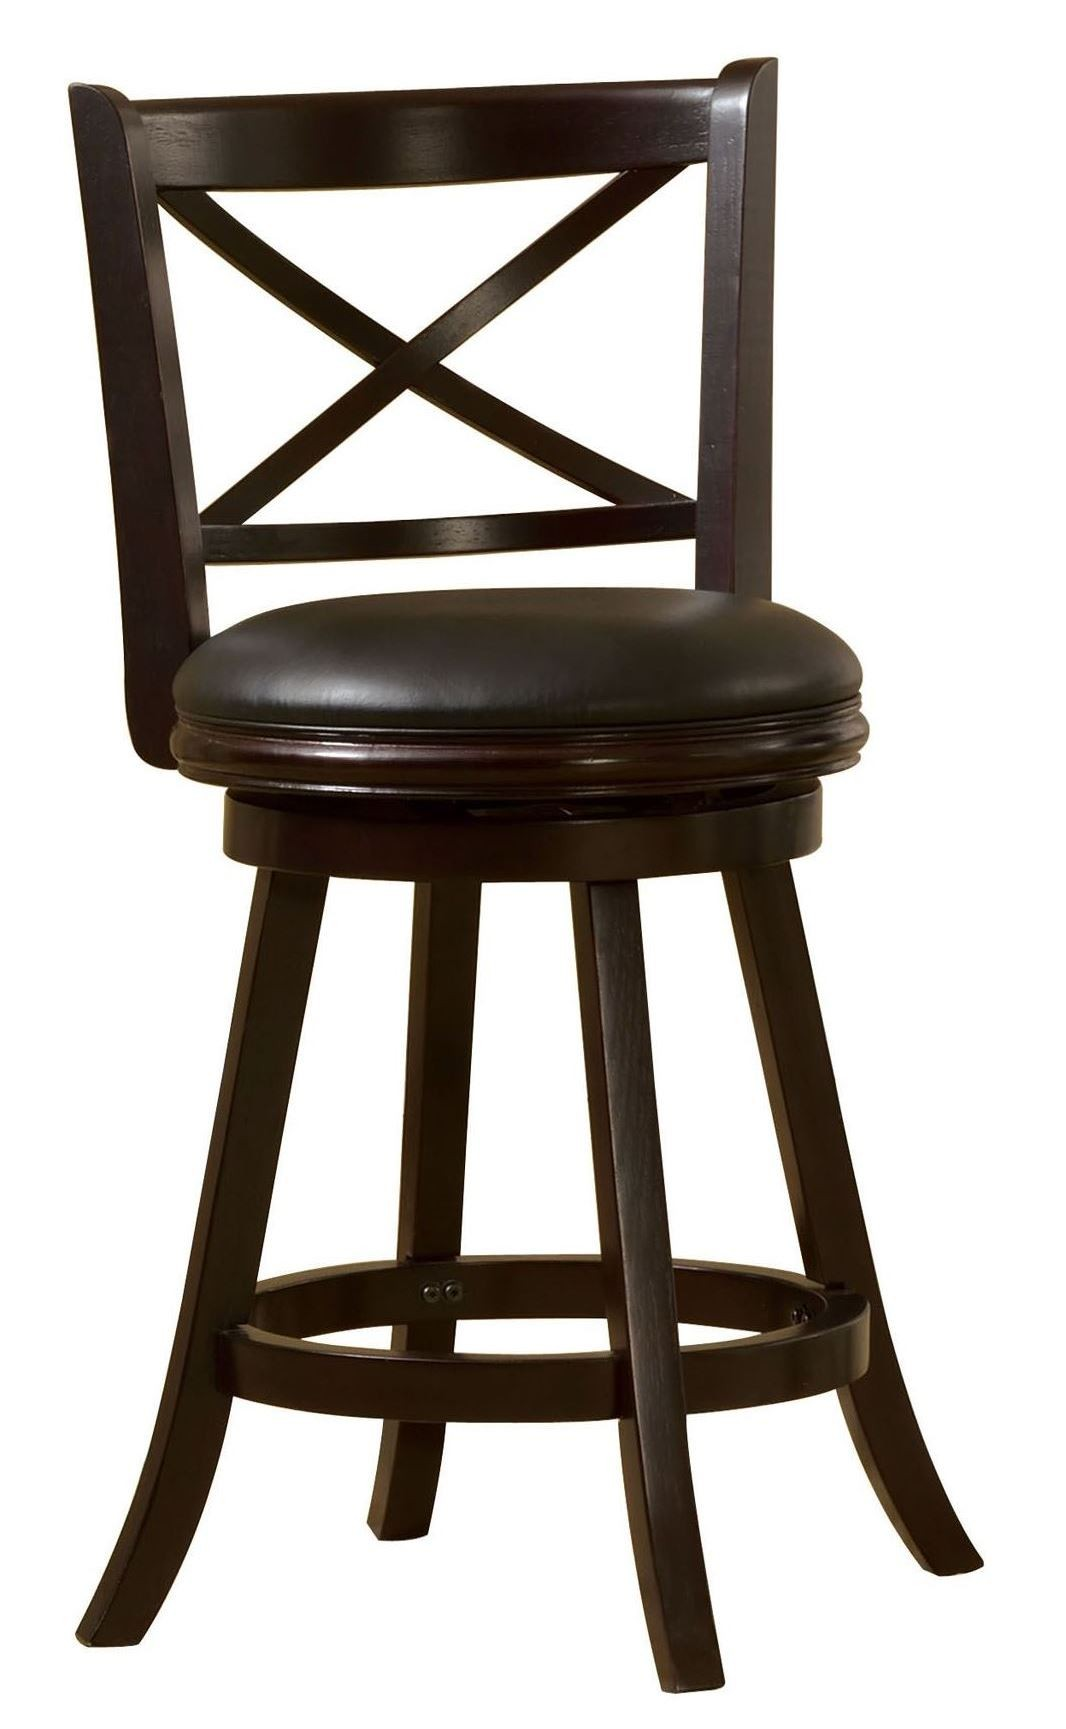 Barnes 24quot Espresso Swivel Bar Stool from Furniture of  : cm br6245 24 from colemanfurniture.com size 1066 x 1729 jpeg 140kB